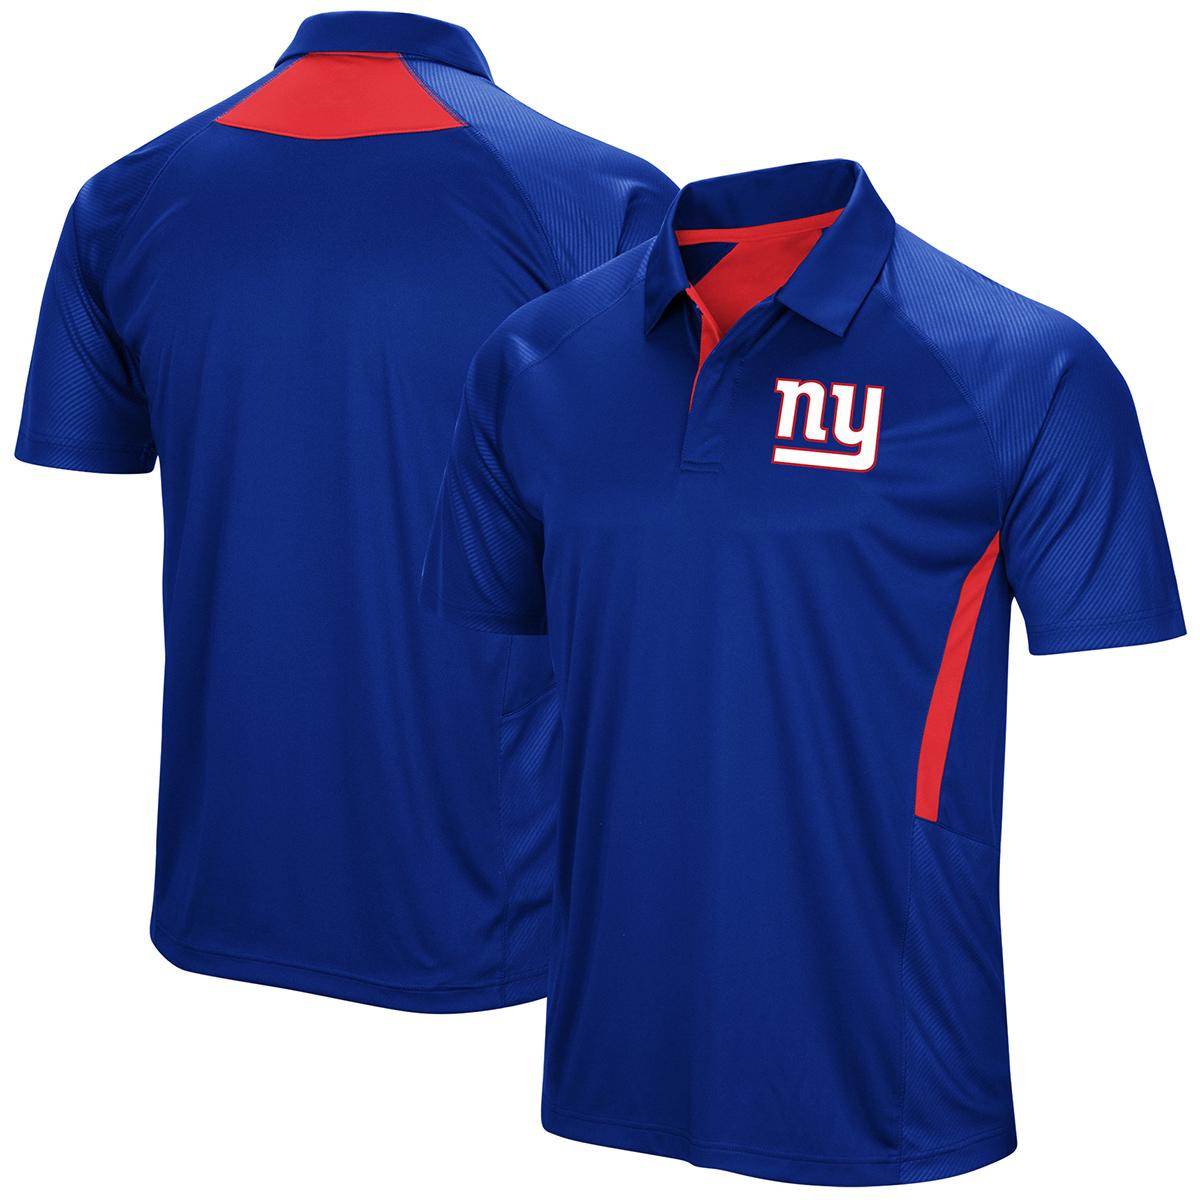 New York Giants Men's Game Day Club Poly Short-Sleeve Polo Shirt - Blue, XL